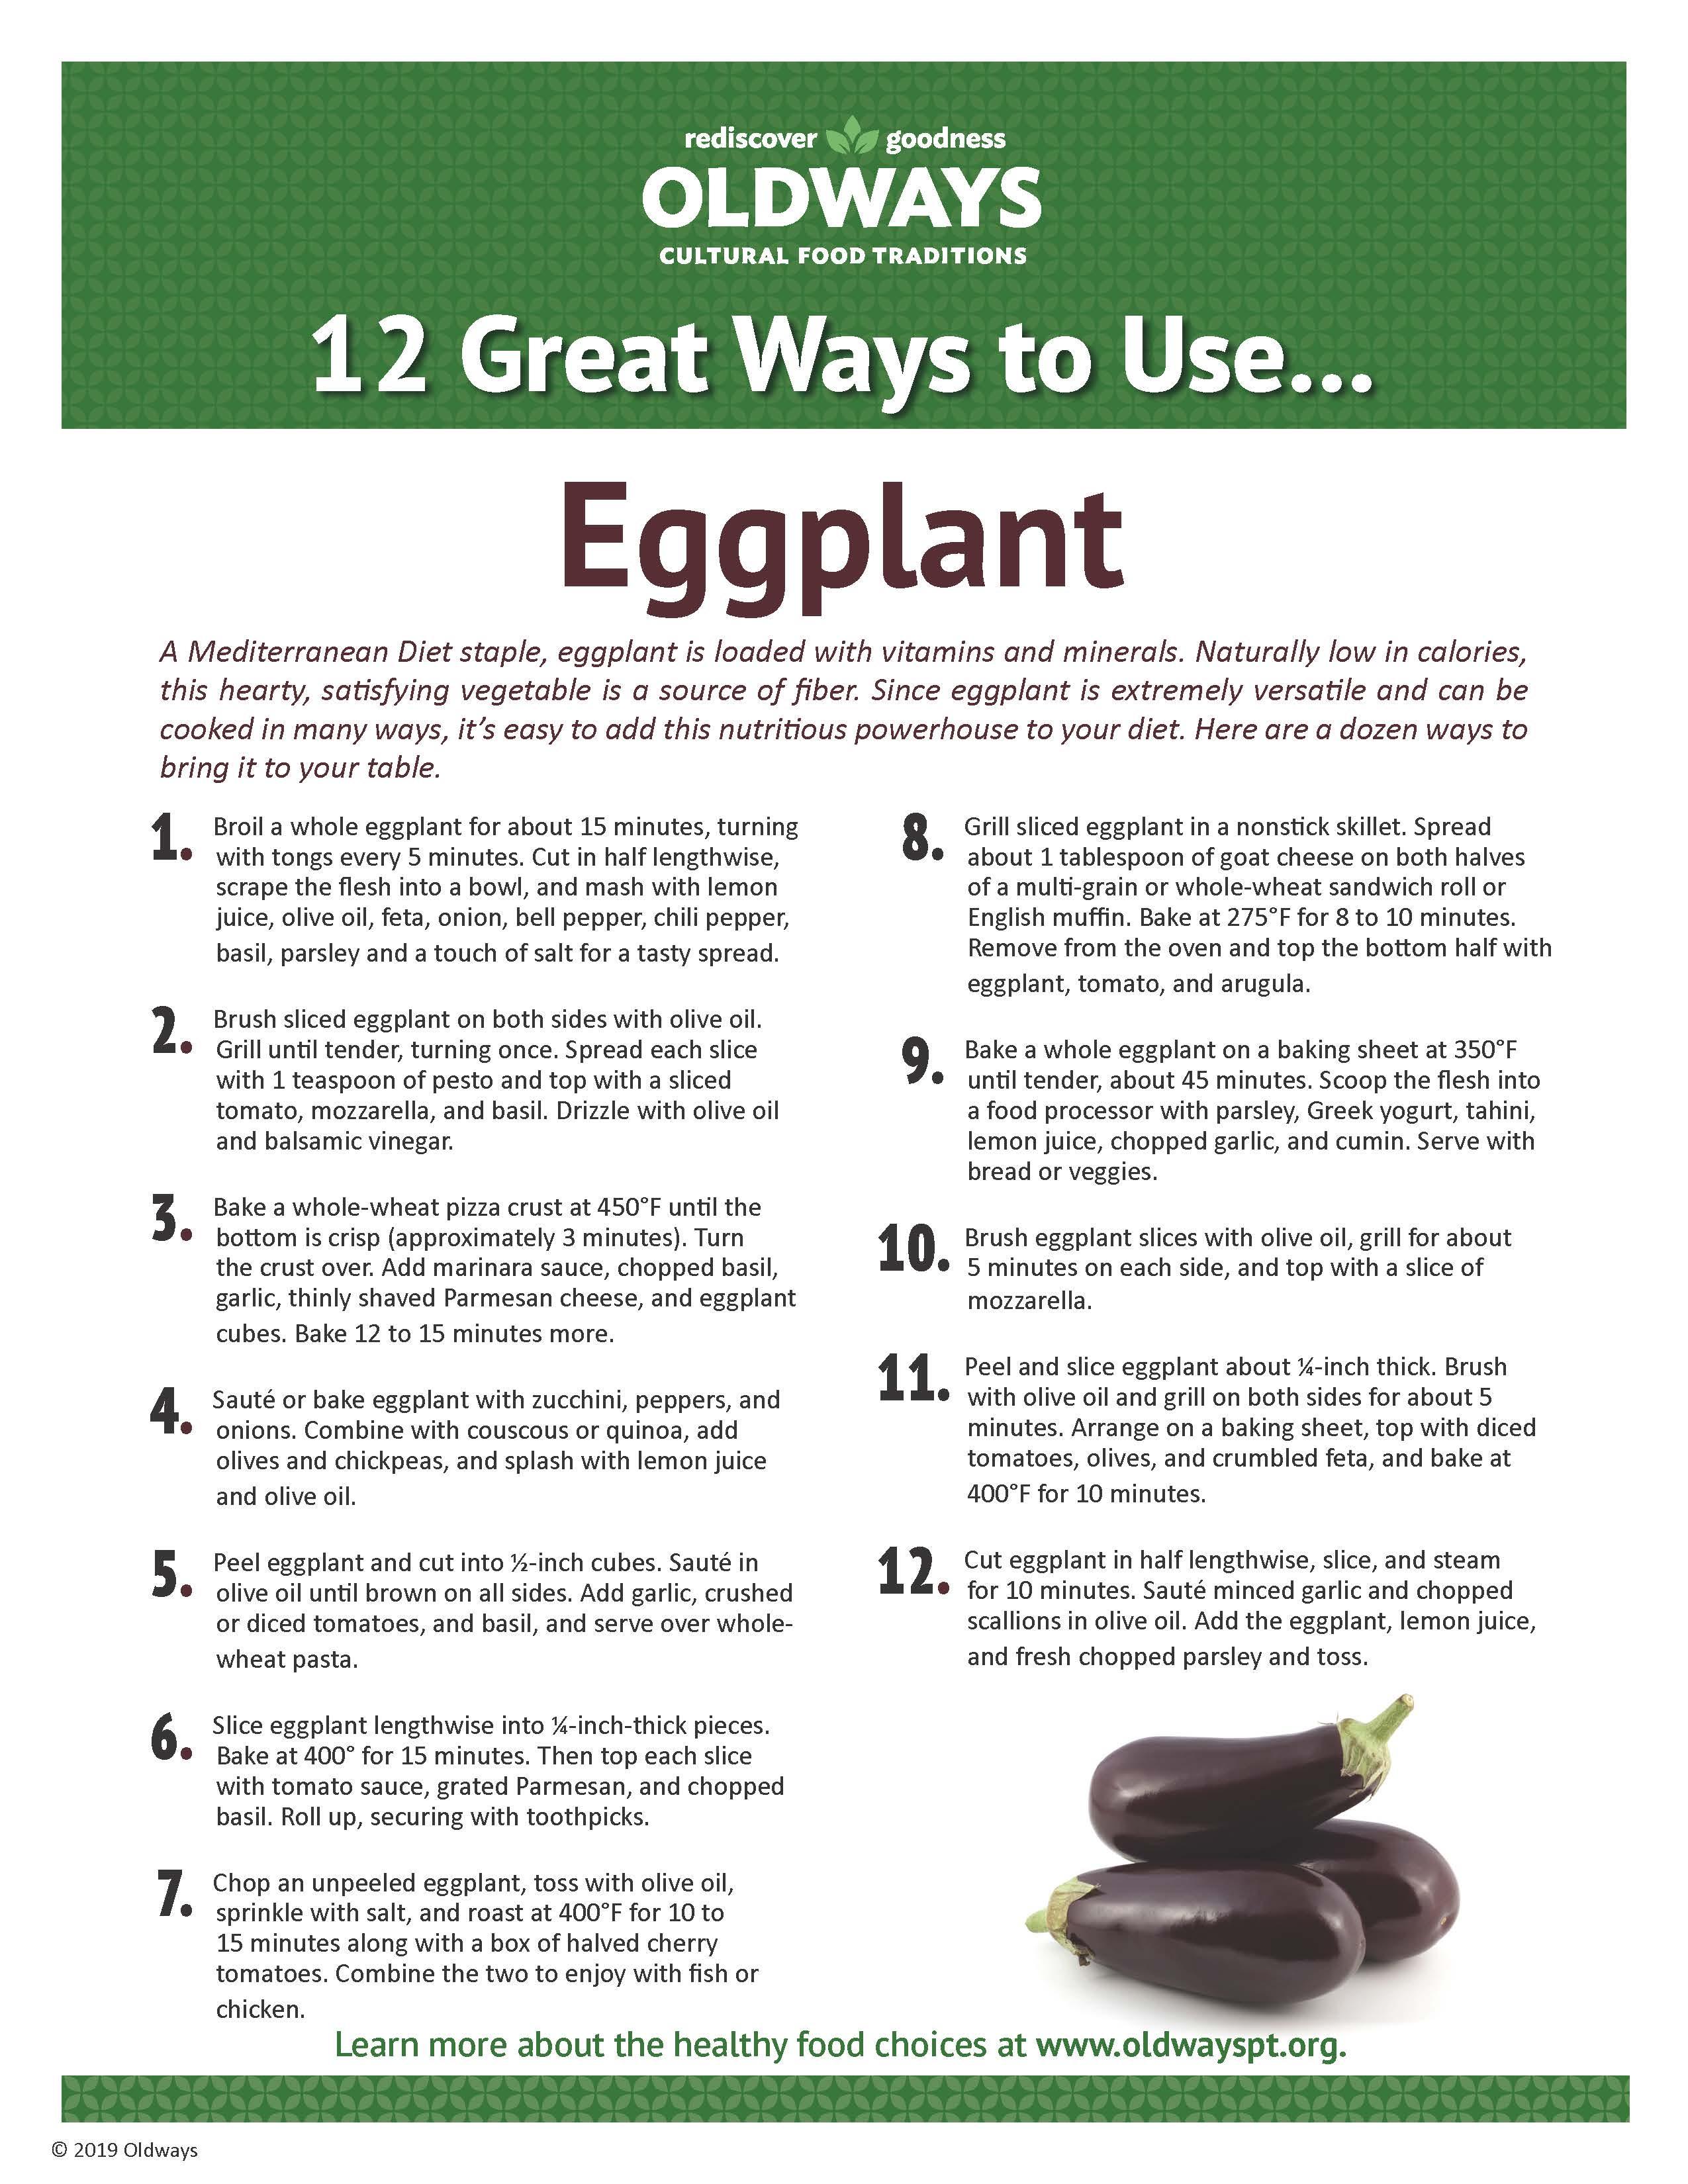 12 Great Ways to Use Eggplant | Oldways